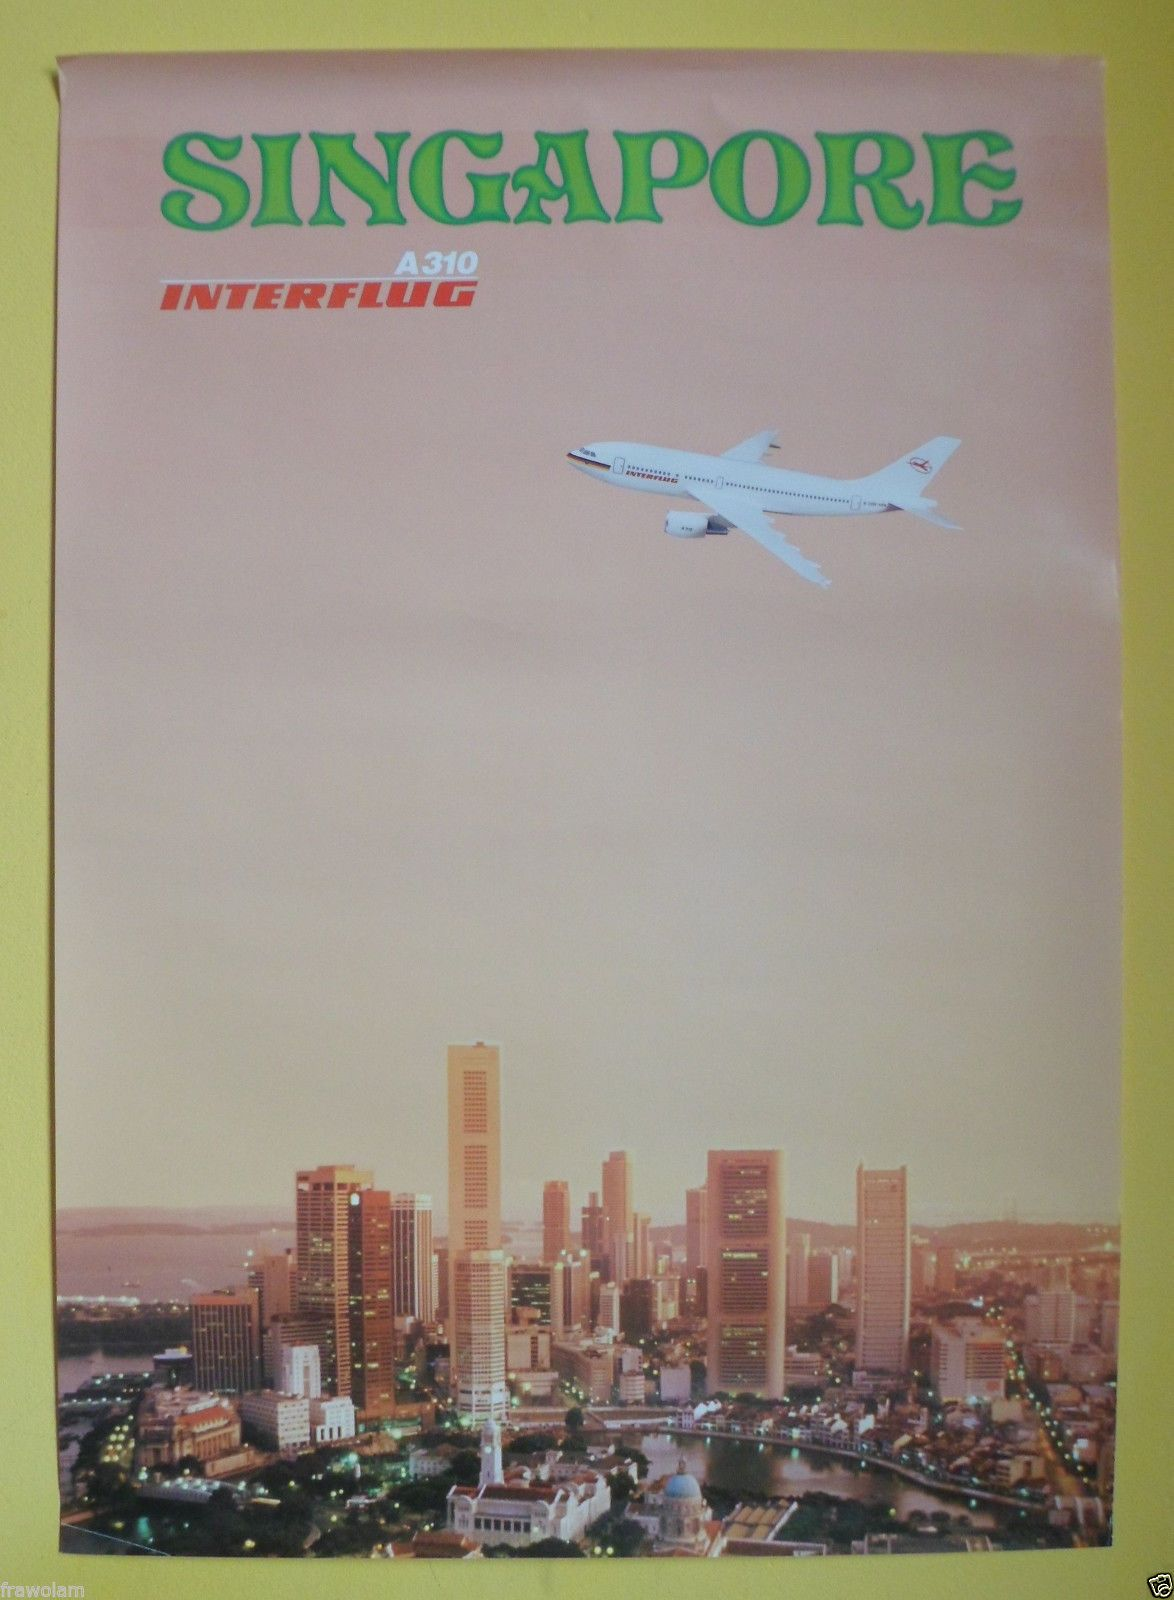 Interflug Large Original Vintage Travel Poster Singapore Airbus A310